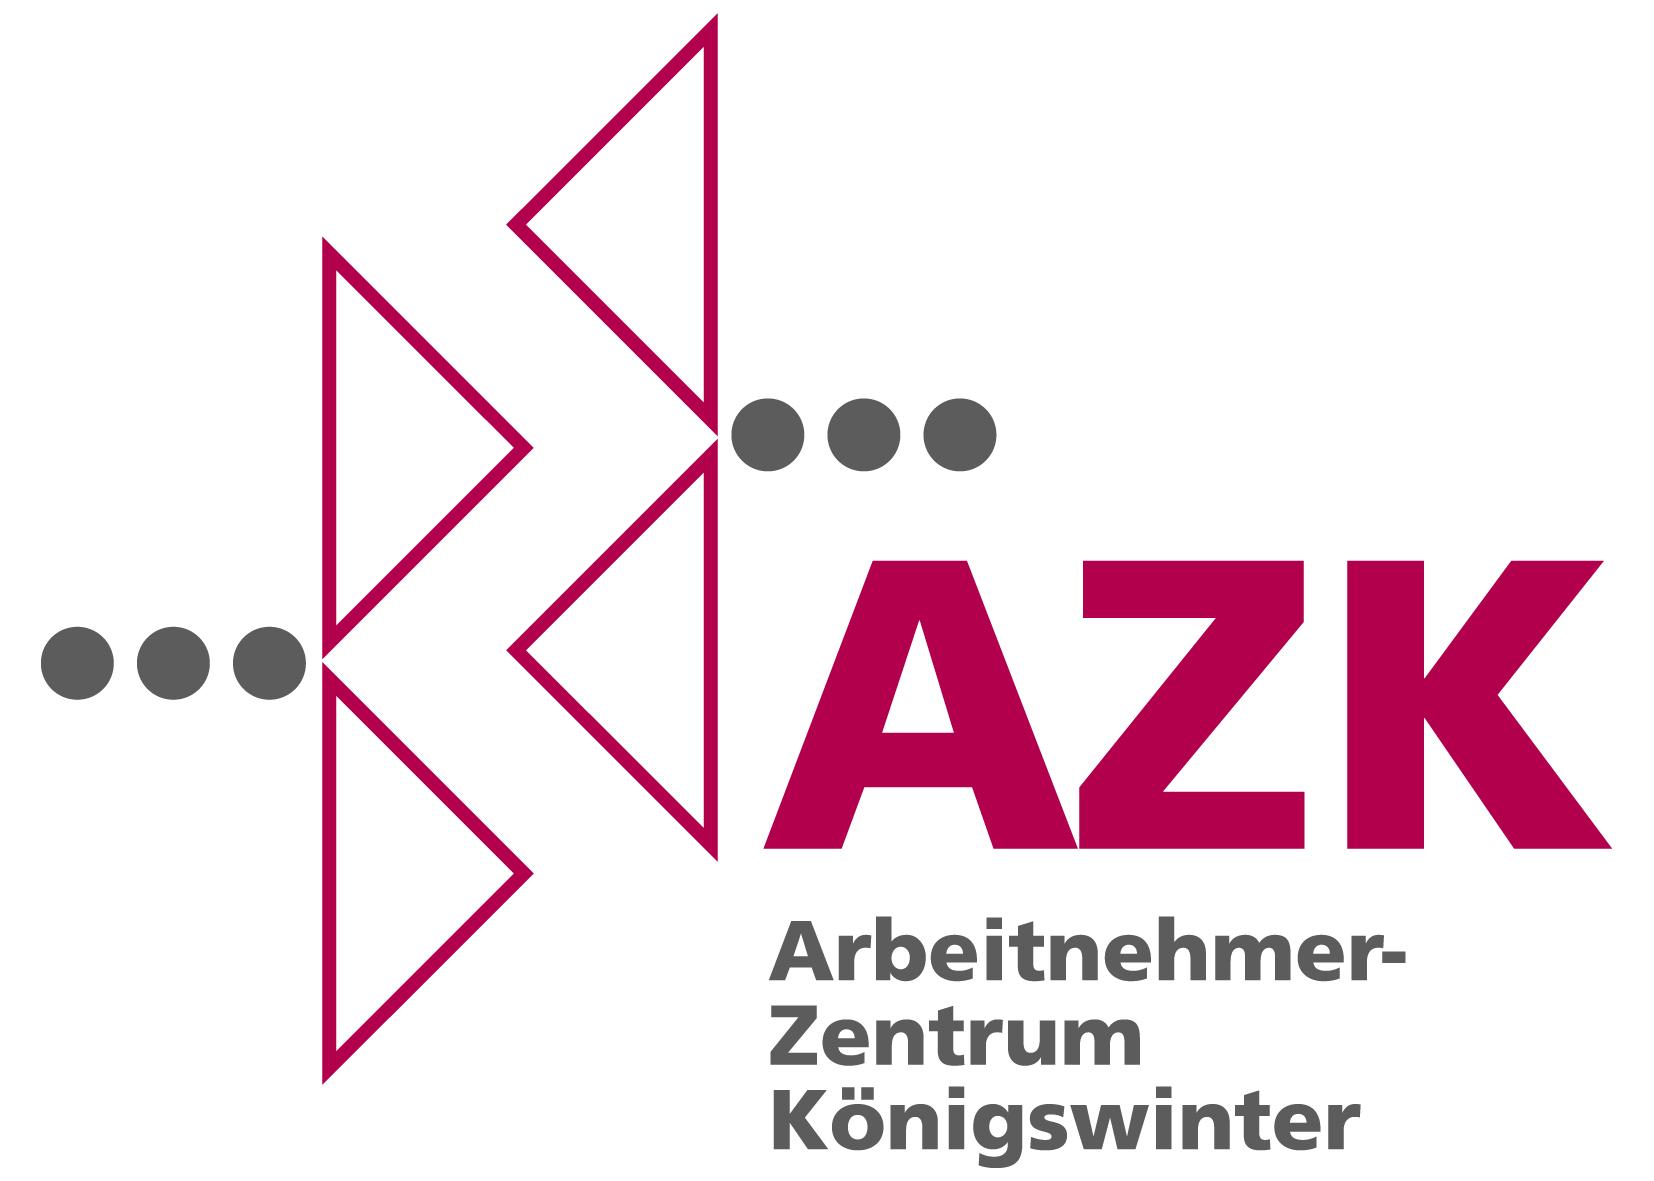 Arbeitnehmer-Zentrum Königswinter (AZK)